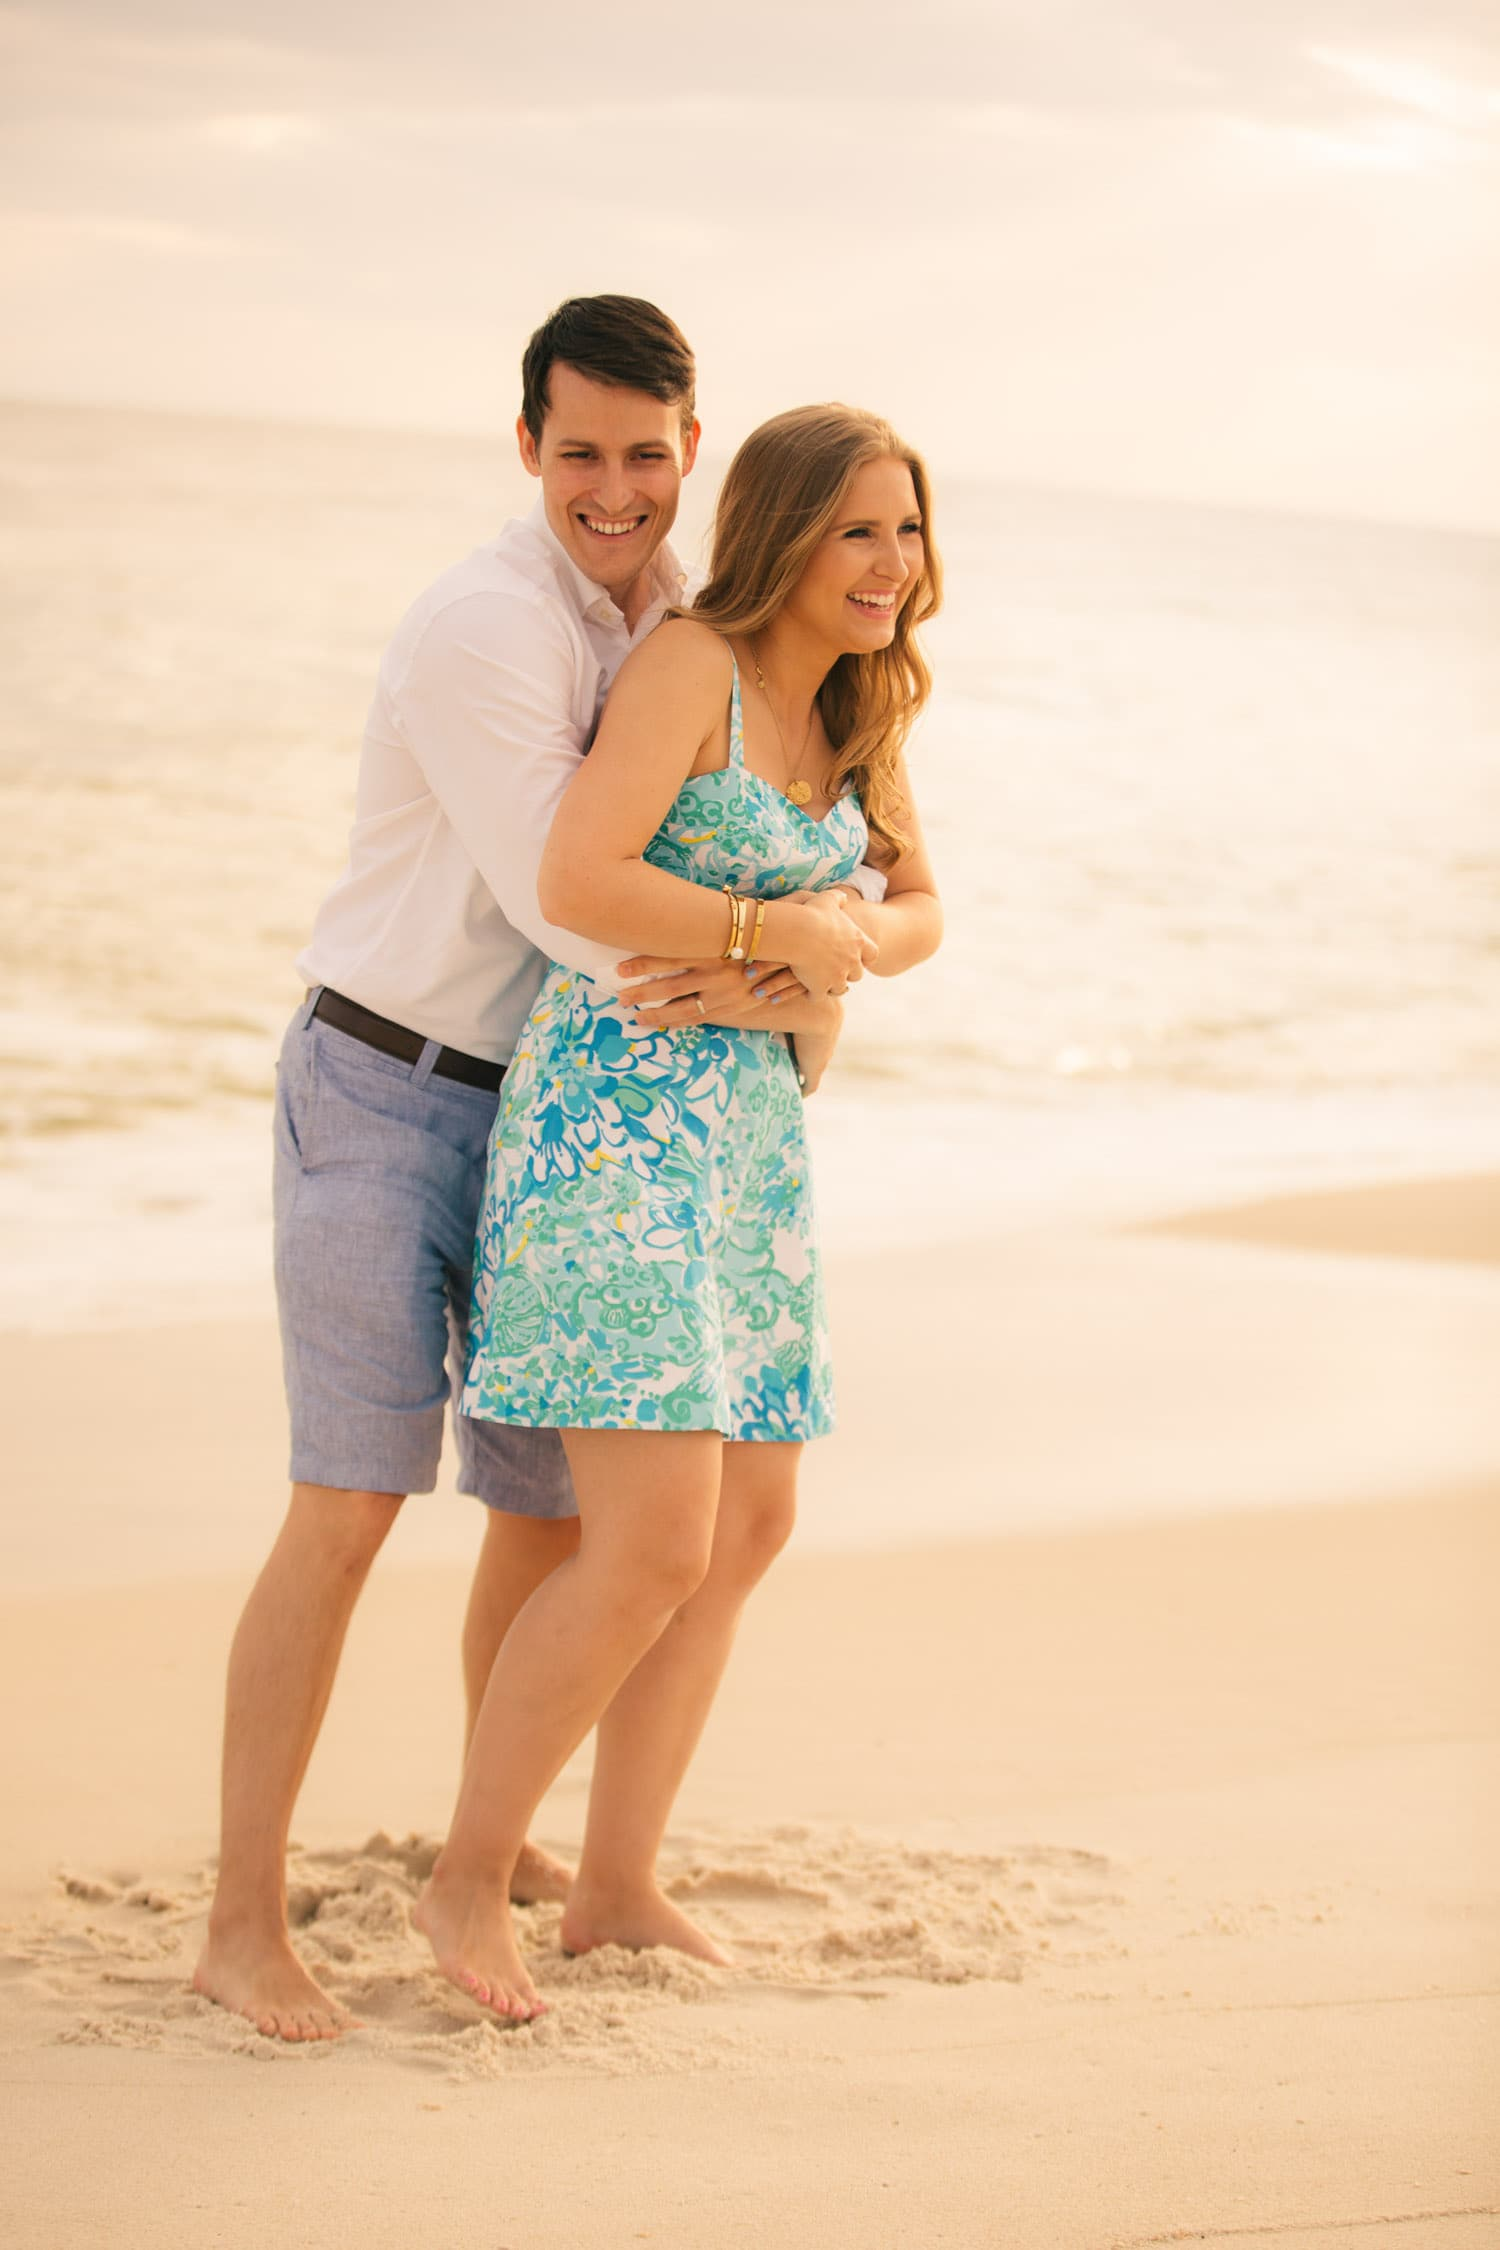 cute-couple-photo-romantic-luxury-weekend-getaway-in-rosemary-beach-florida-41